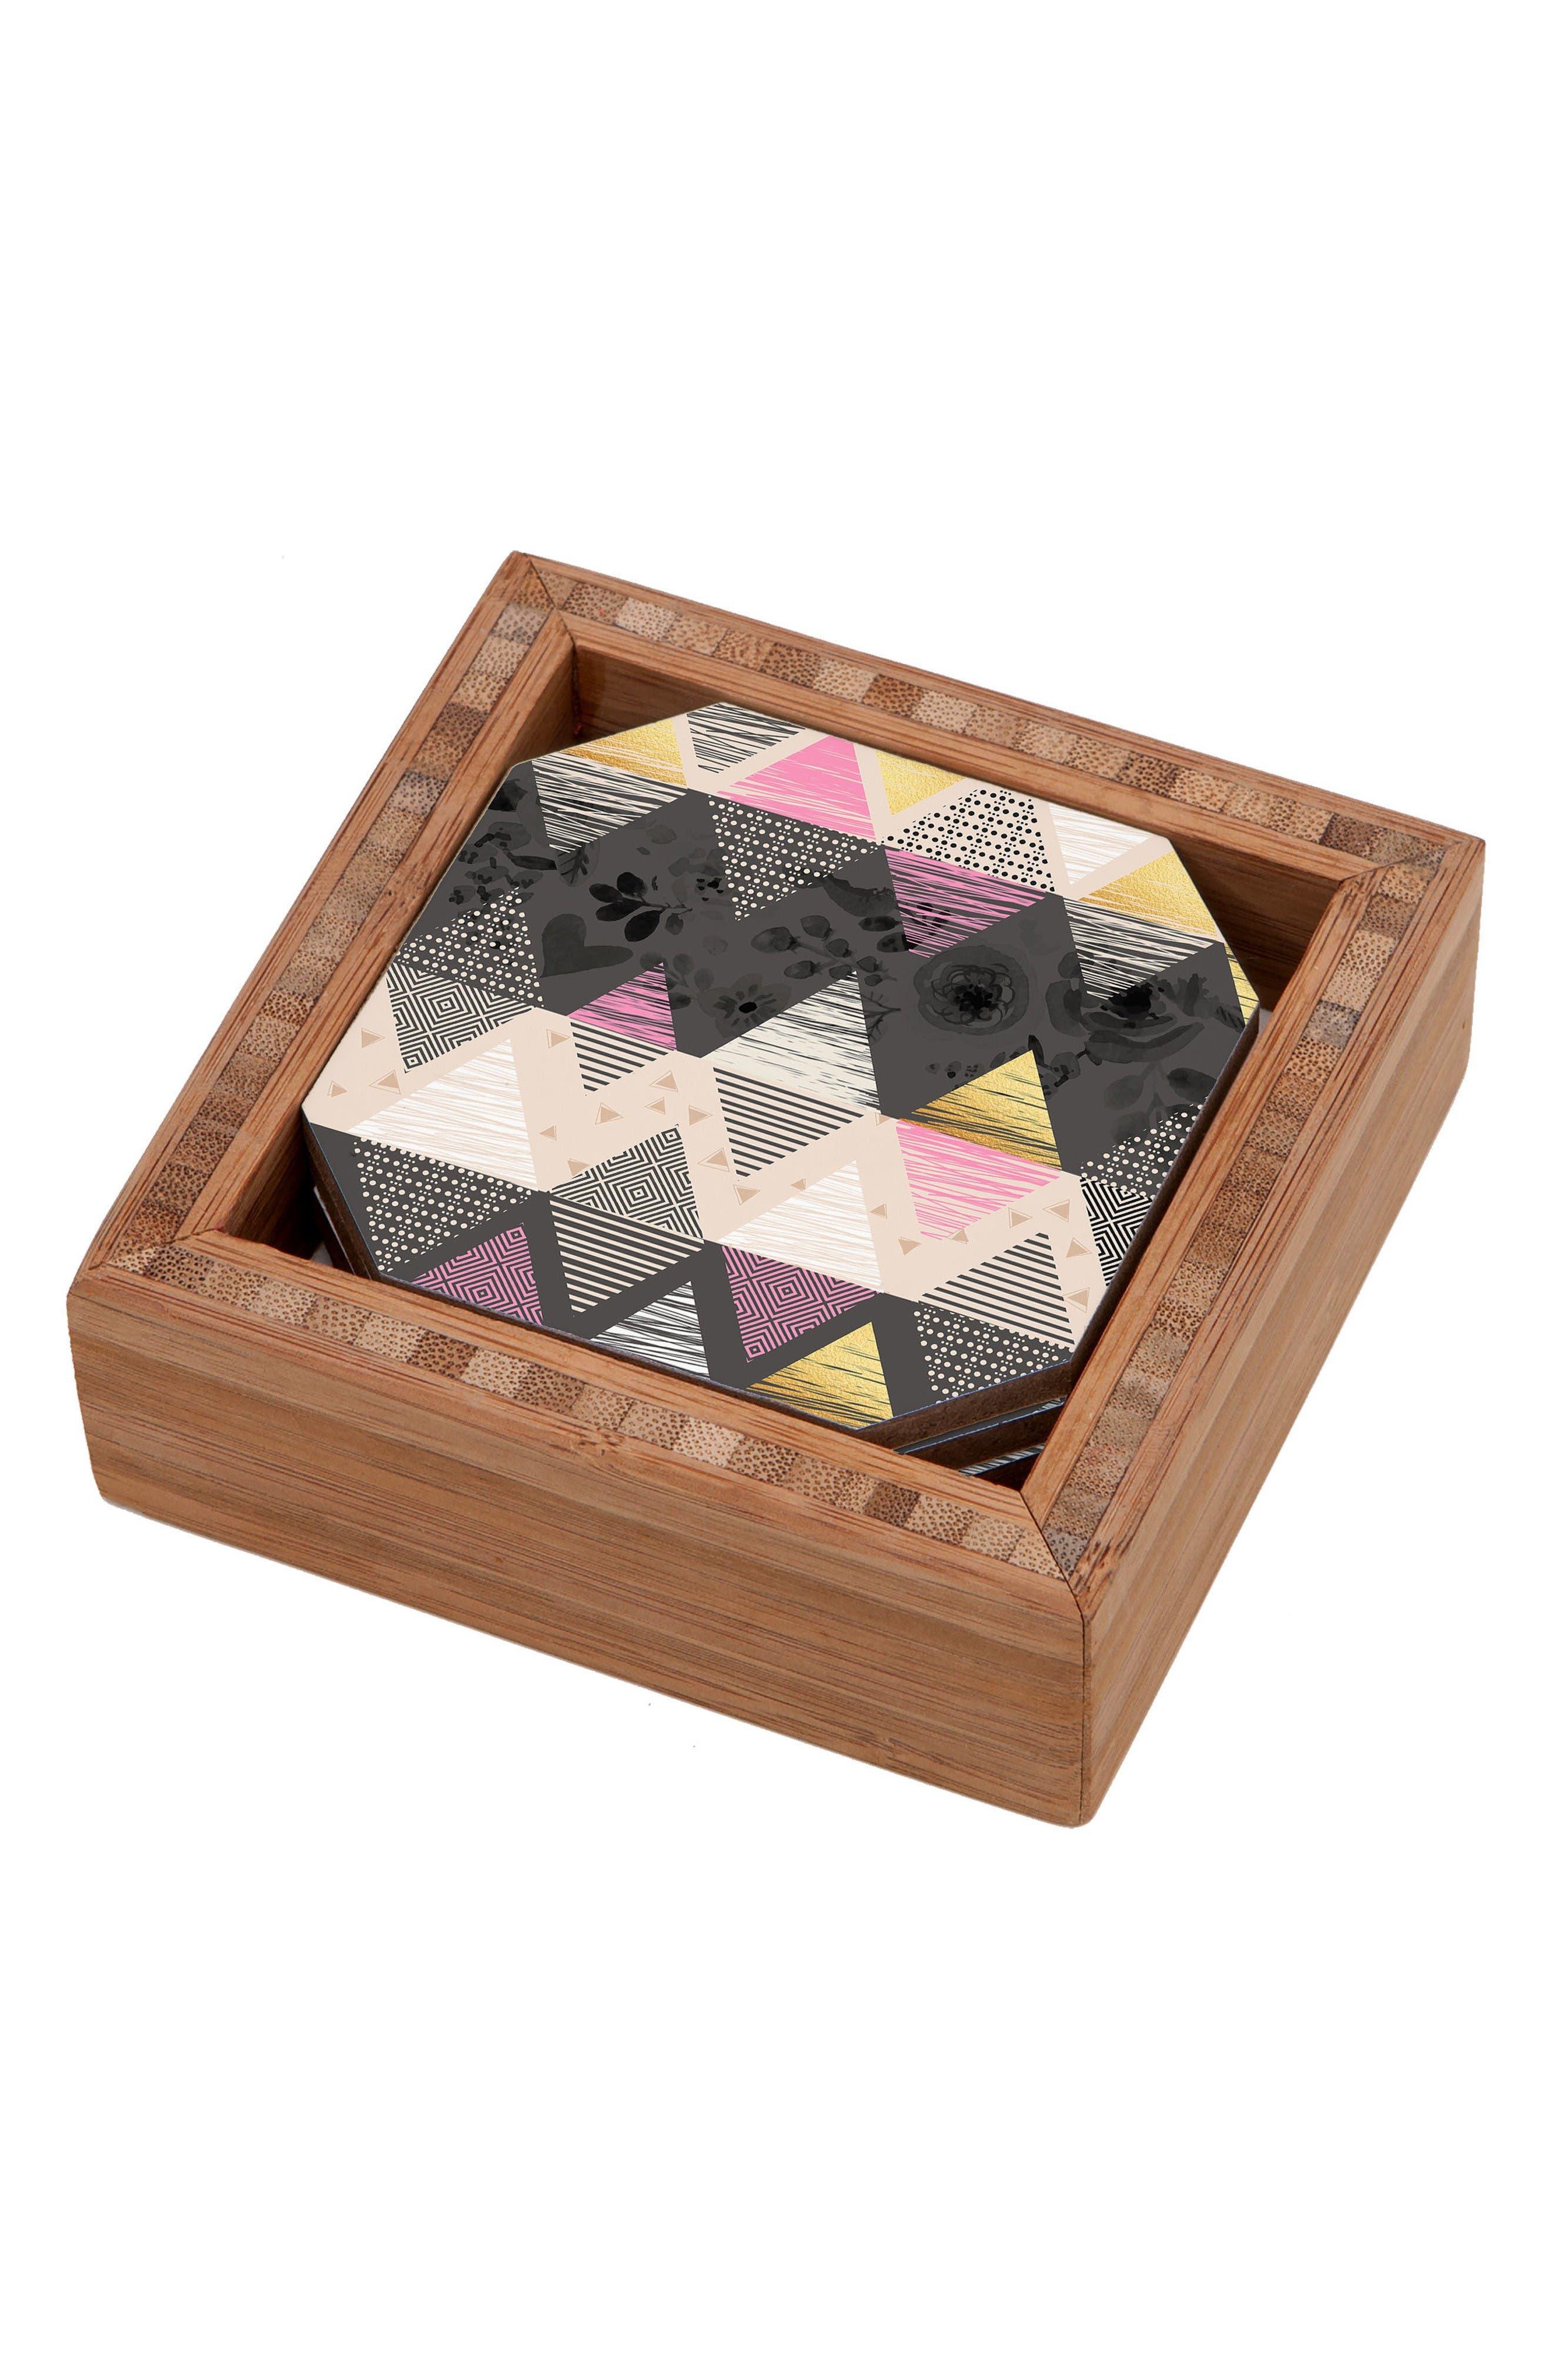 Main Image - Deny Designs Geometric Set of 4 Coasters